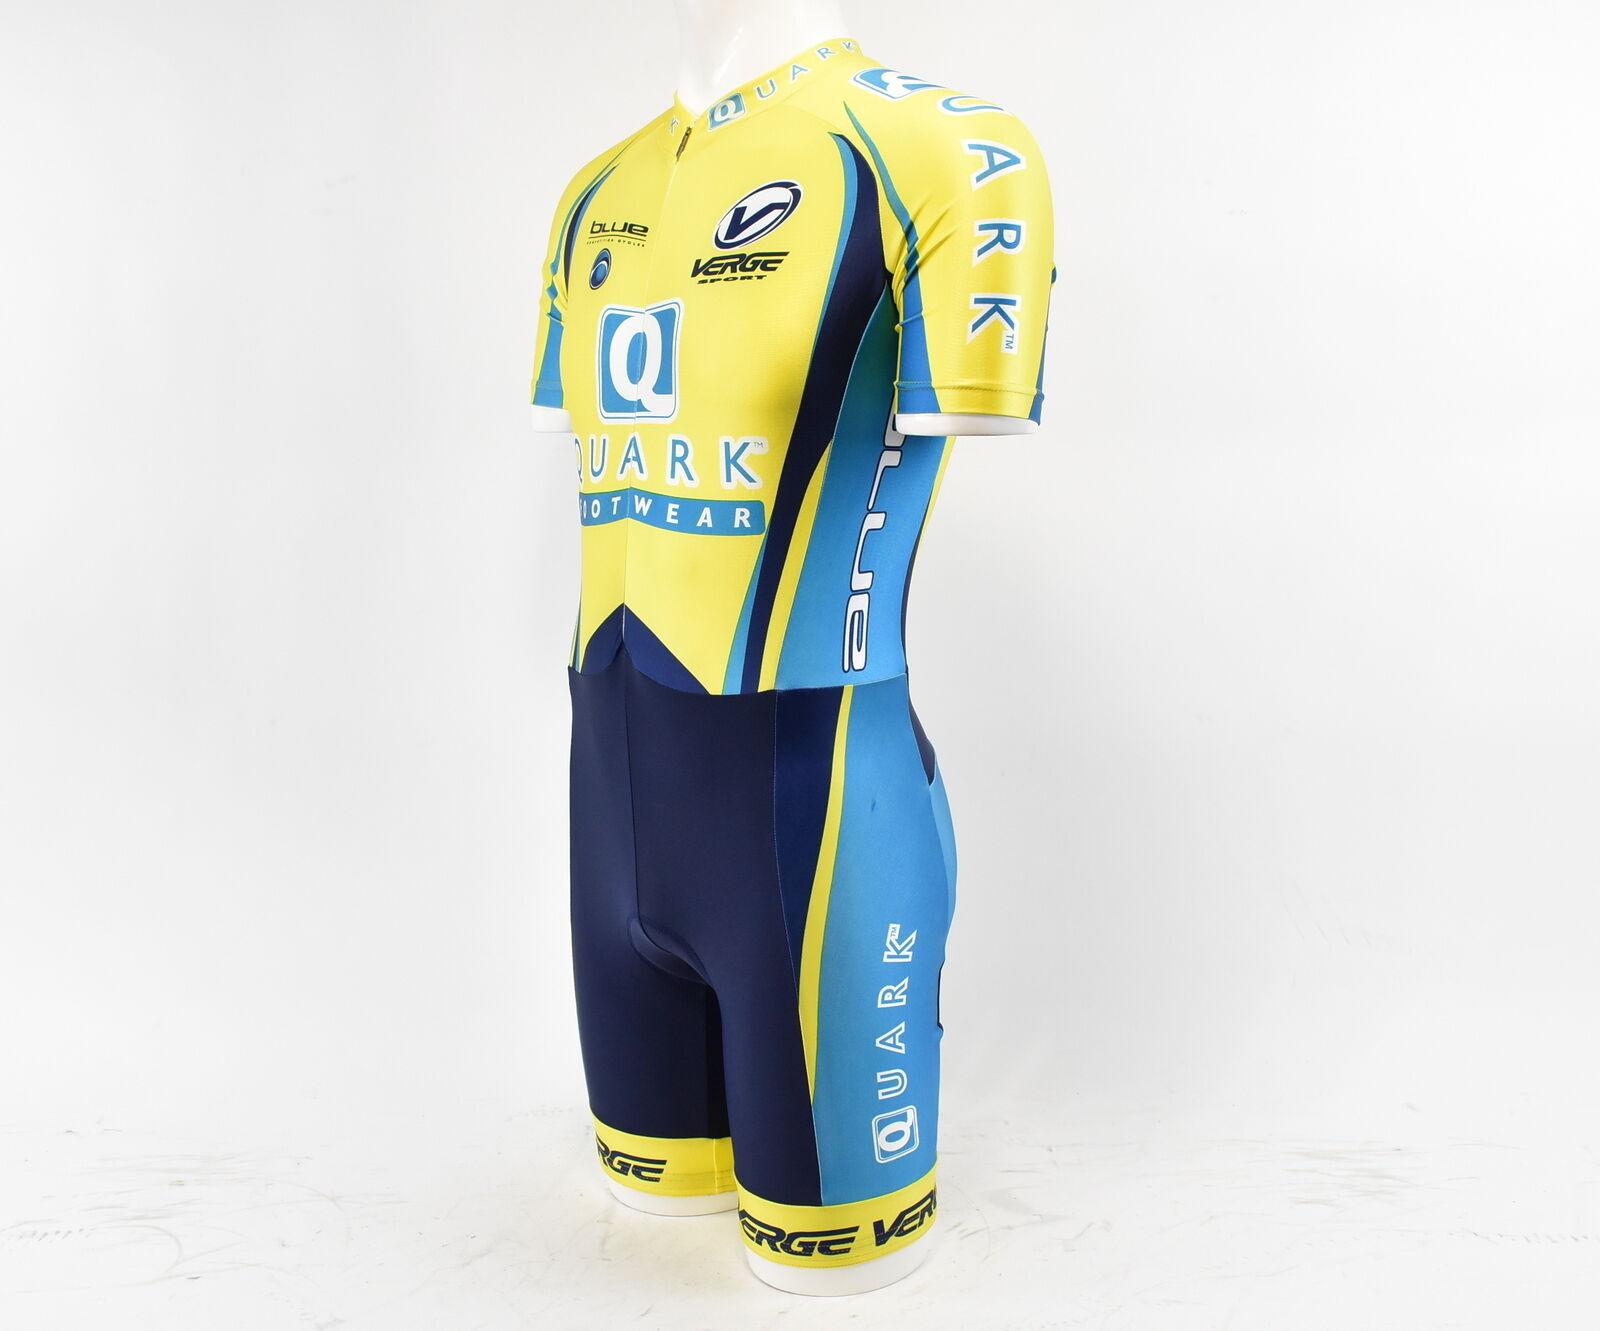 Verge Team Quark Wouomo Short Sleeve Lycra Cycling Skinsuit gialloblu L NOS